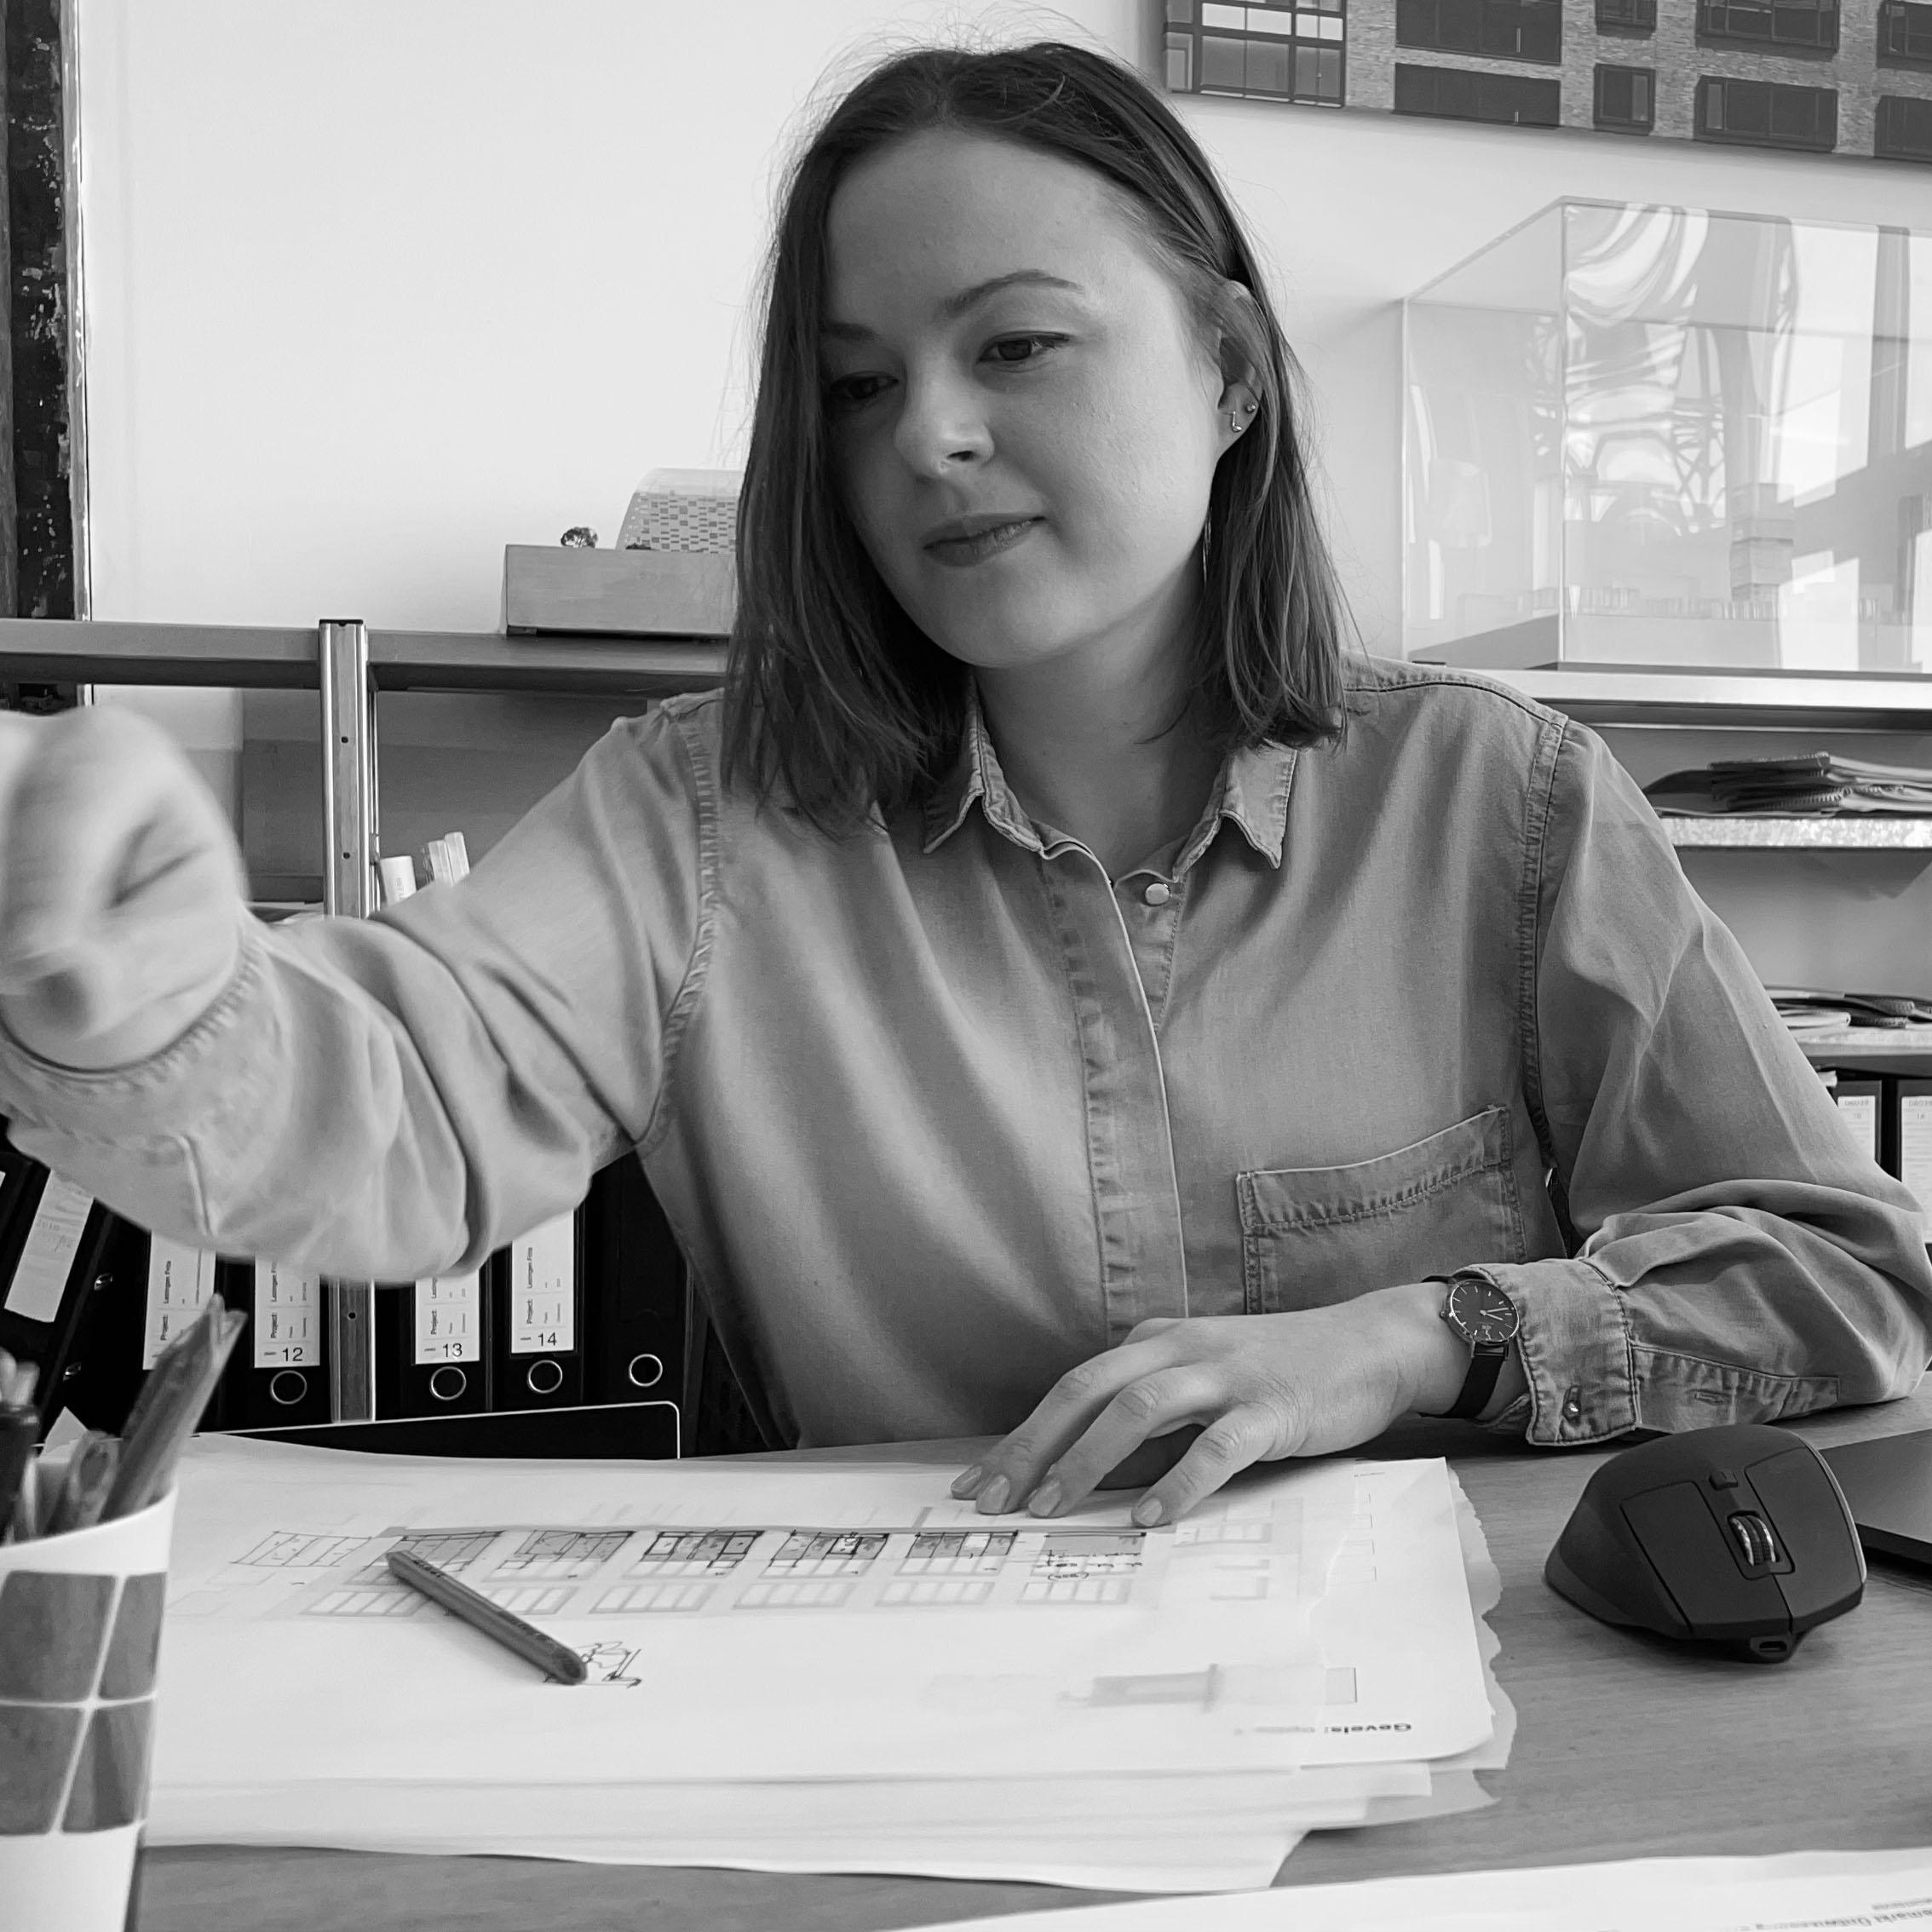 Kamila Glodowska